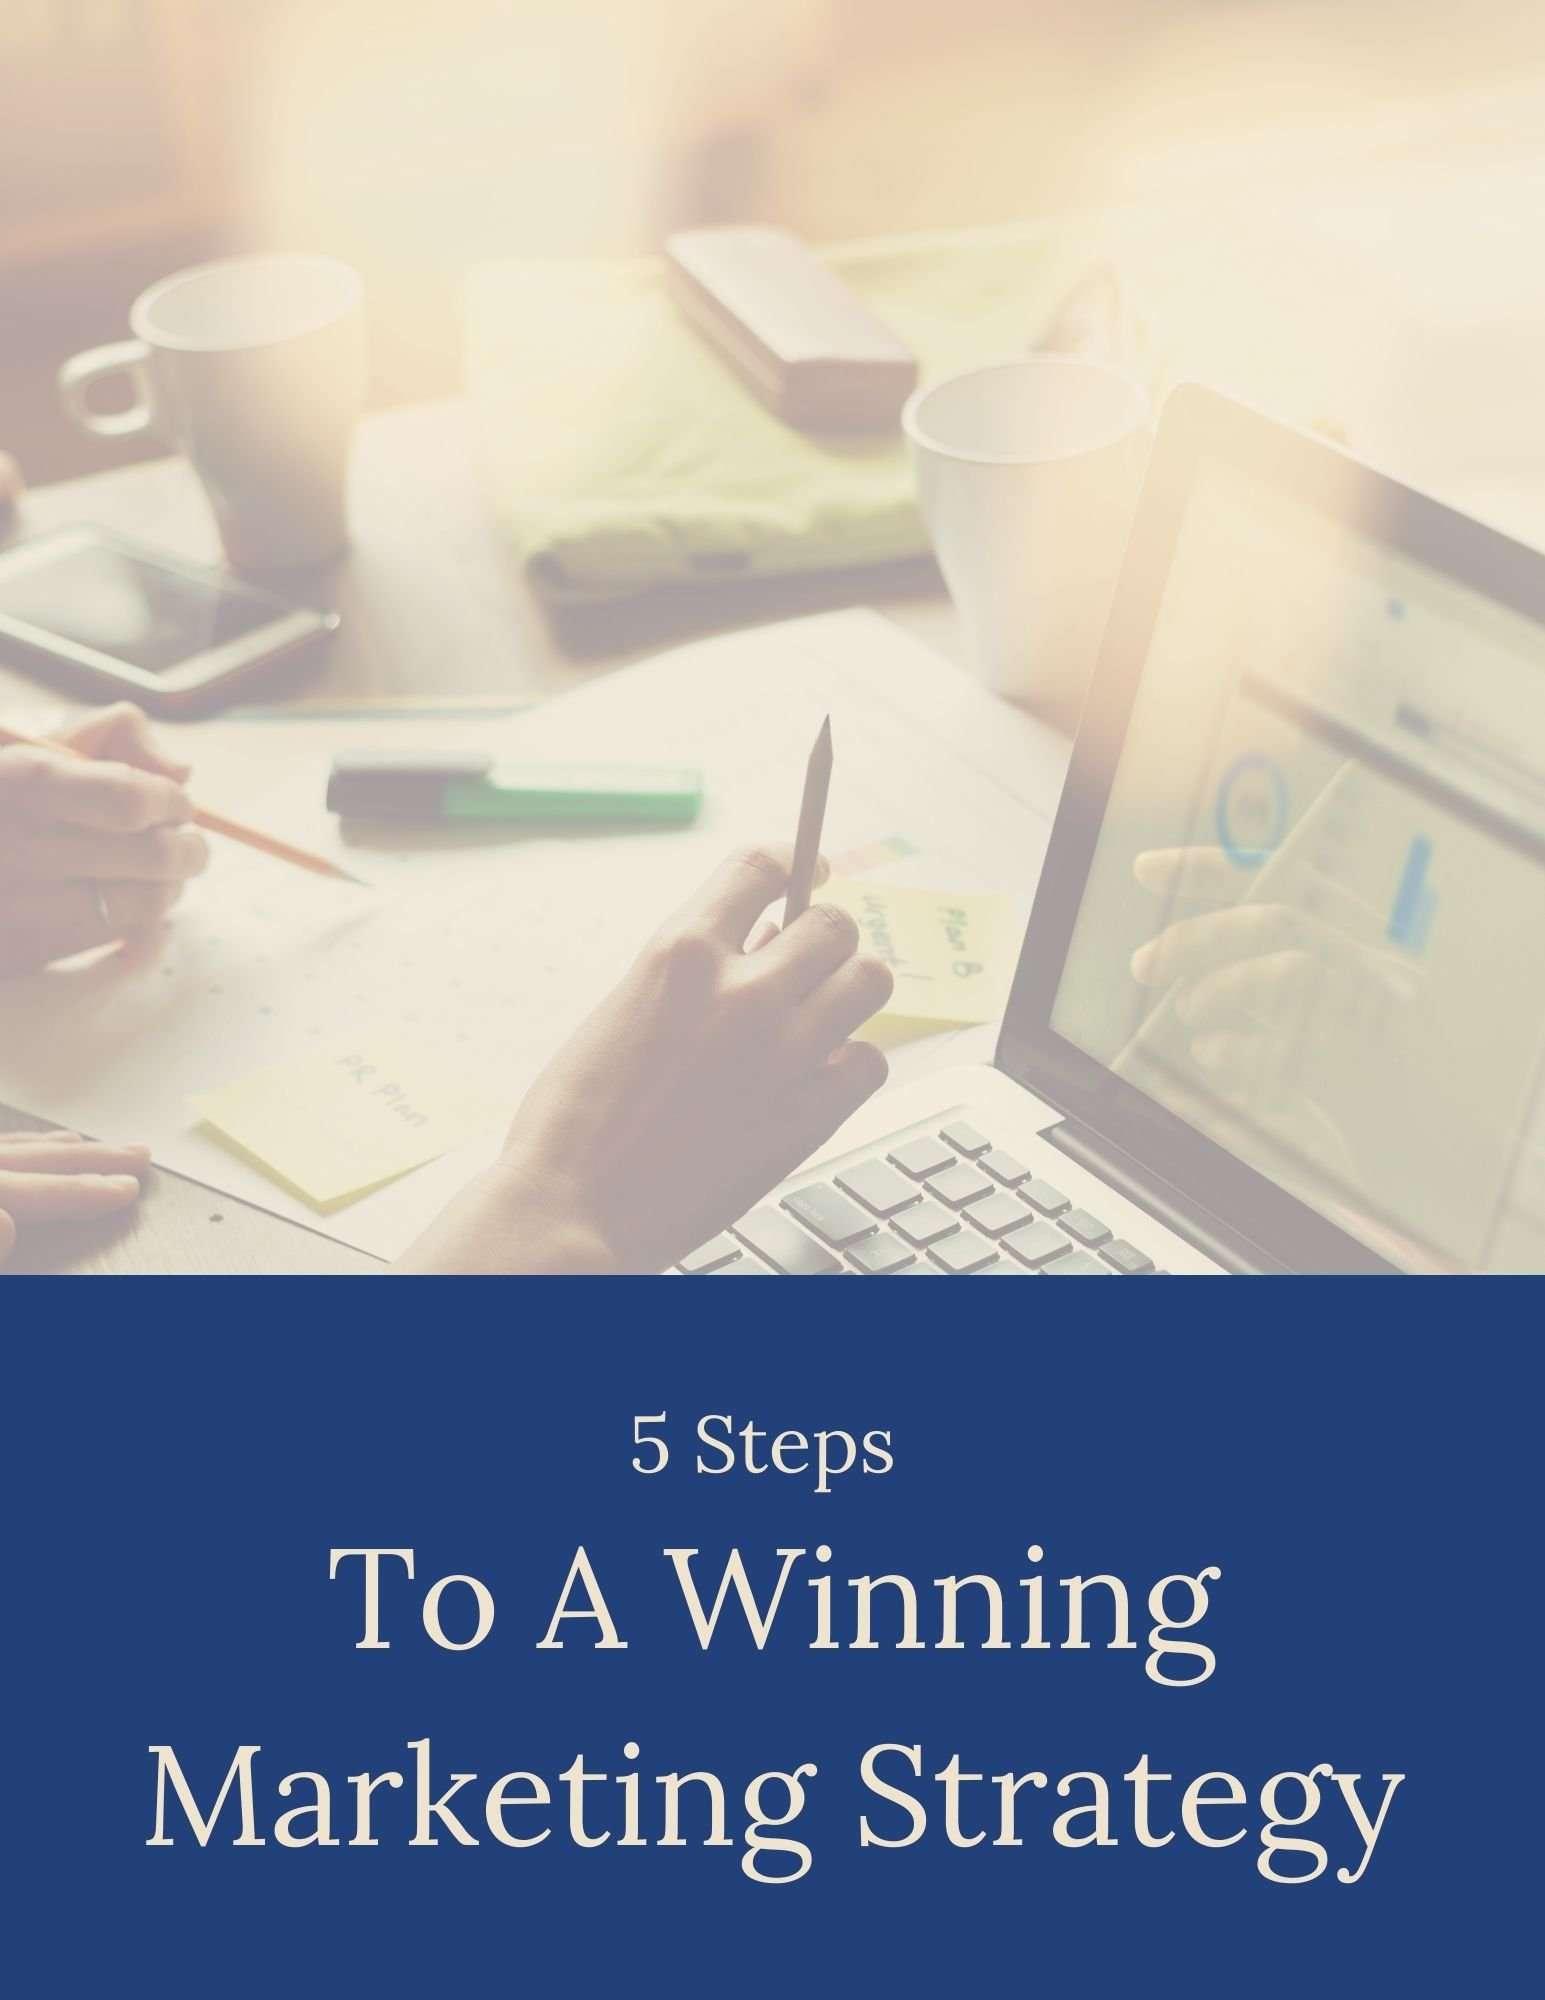 5 Steps To A Winning Marketing Strategy